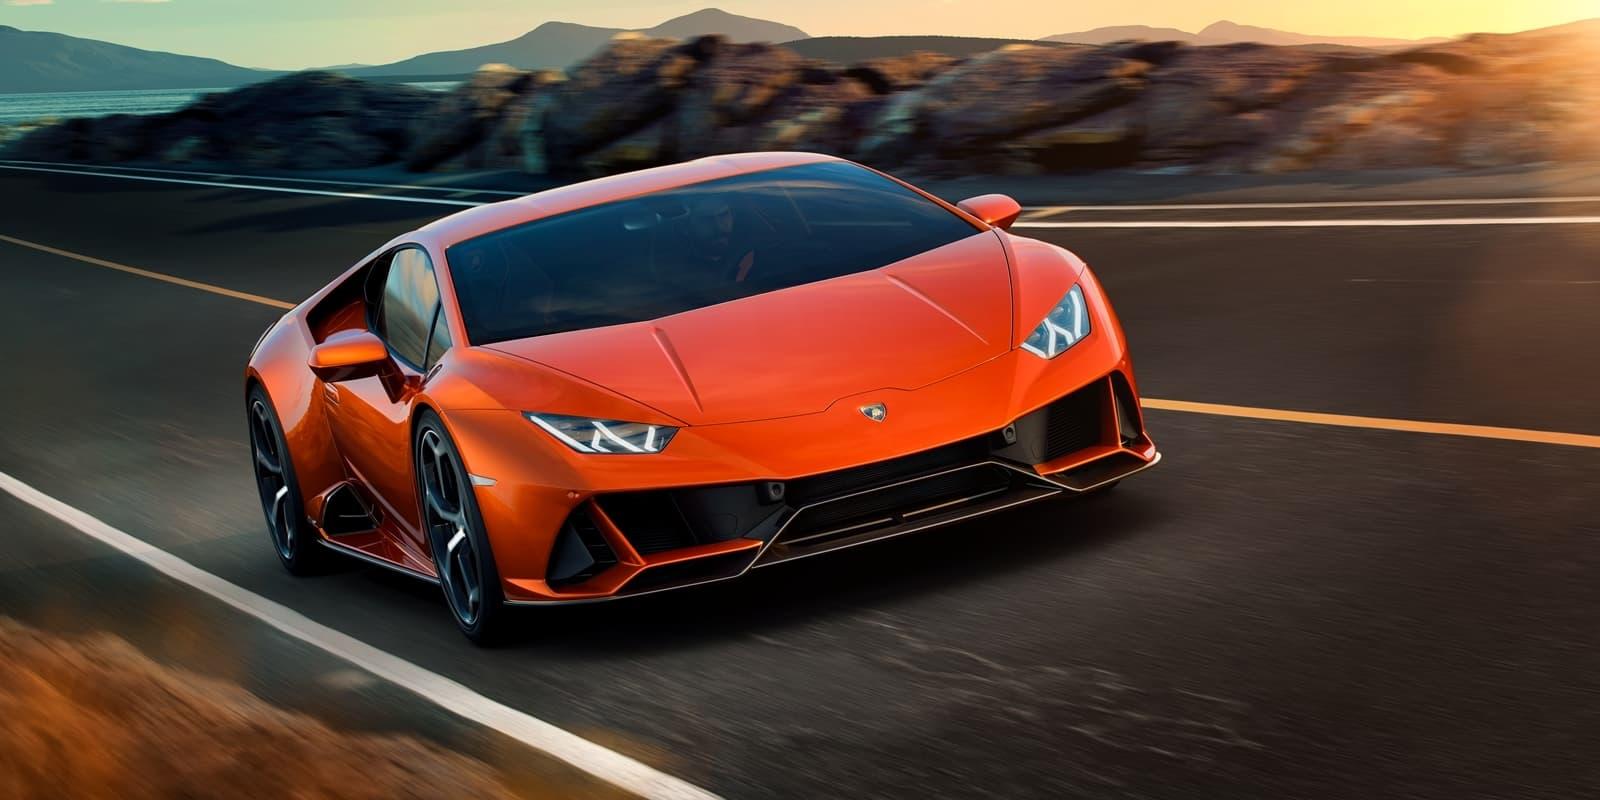 Lamborghini anticipará un modelo totalmente nuevo: será un Gran Turismo